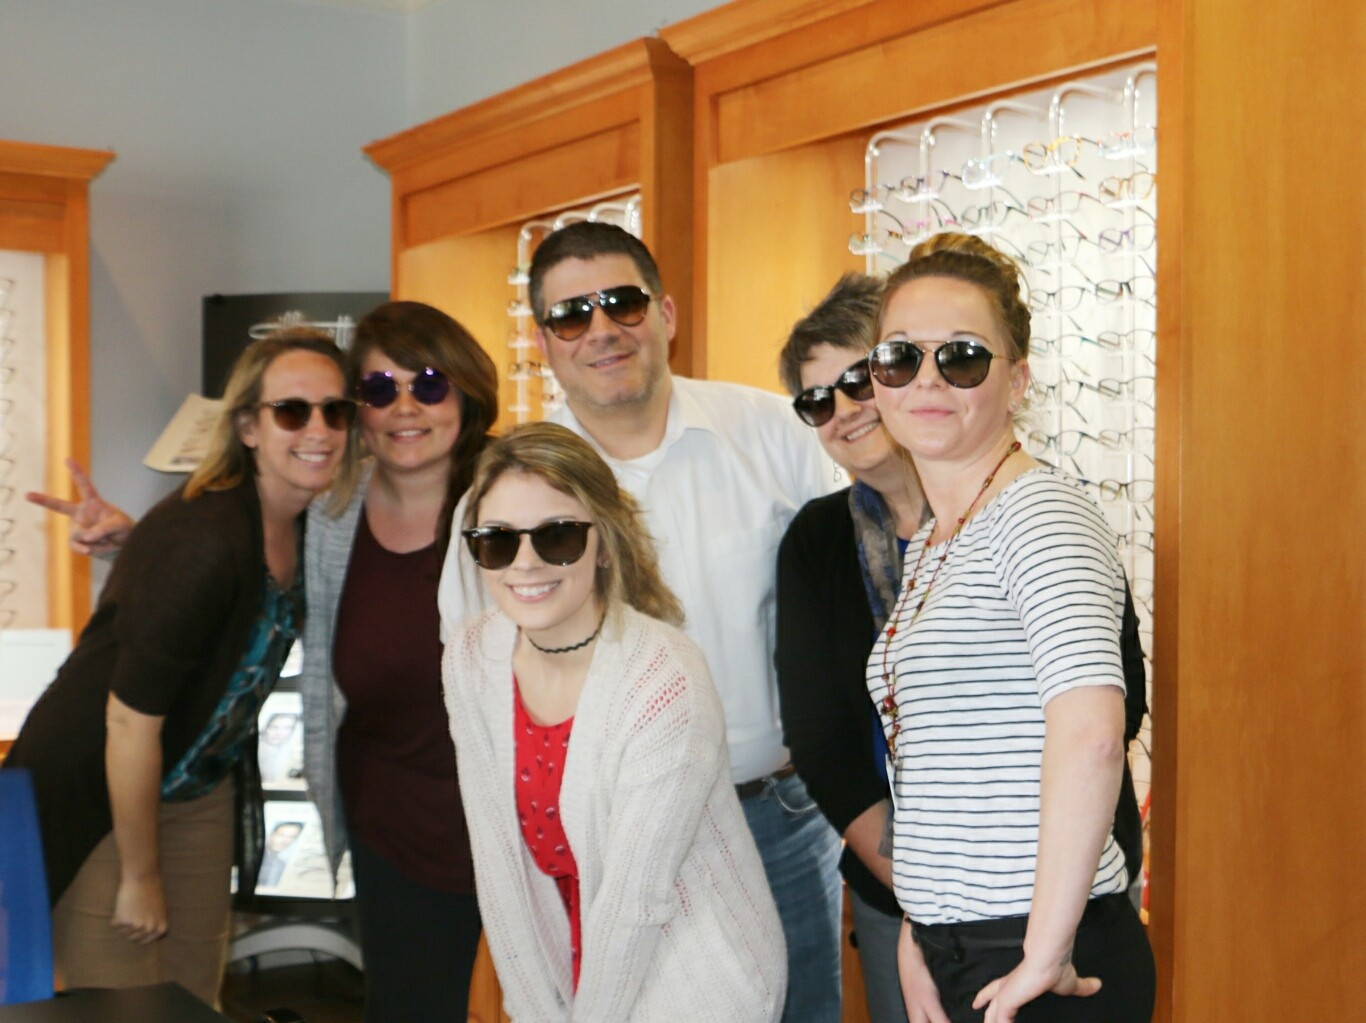 Brad-sunglasses-1  -princeton-wv-pearisburg-va